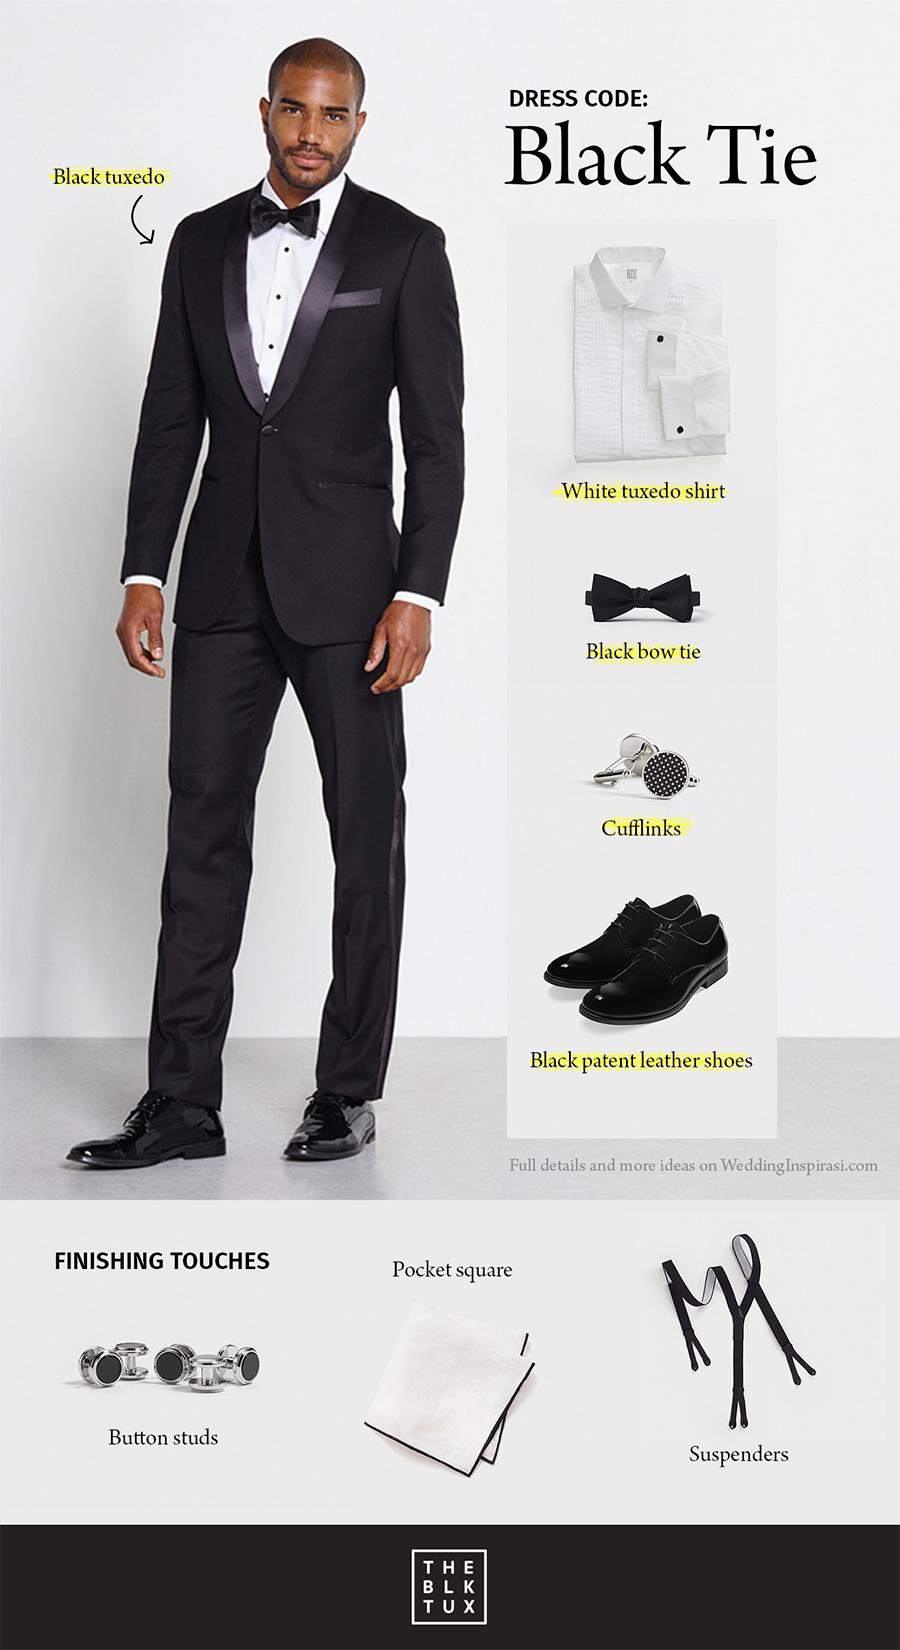 b55ee651b6ef the black tux wedding dress code black tie modern style suit tuxedo rental  service